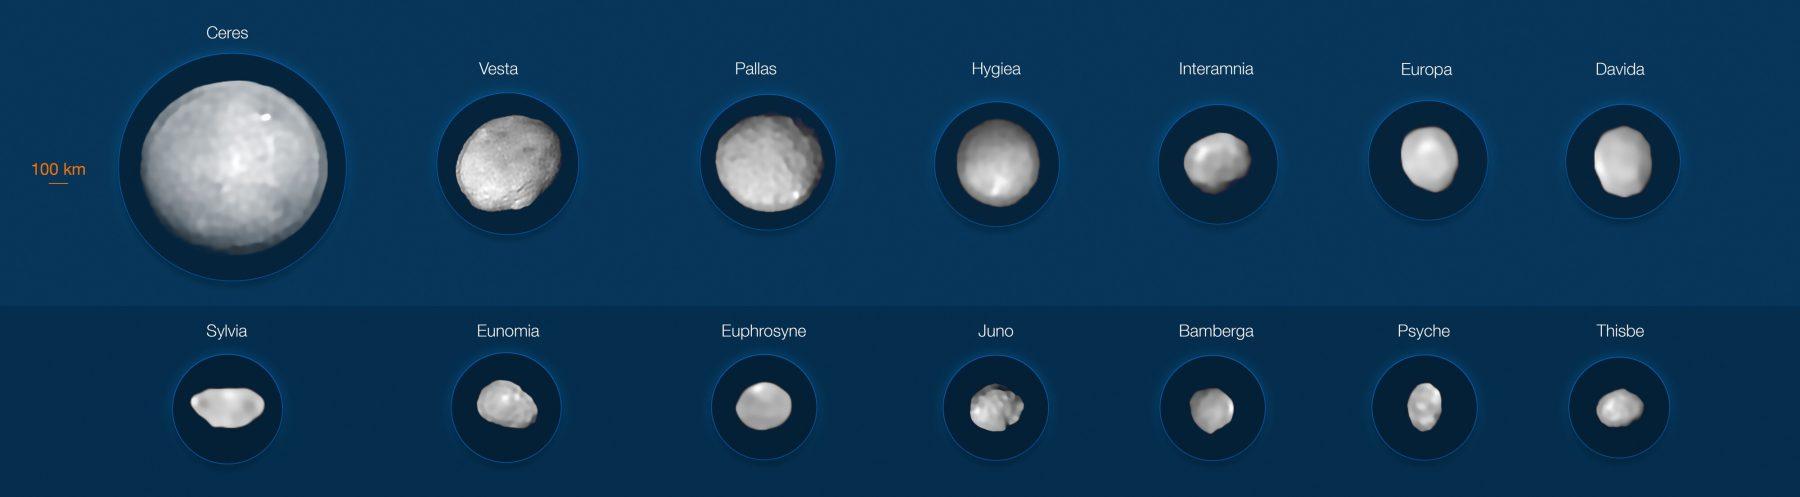 14 largest asteroids in the Solar System. Credit: M. Kornmesser, Vernazza et al. (ESO); MISTRAL algorithm (ONERA / CNRS)